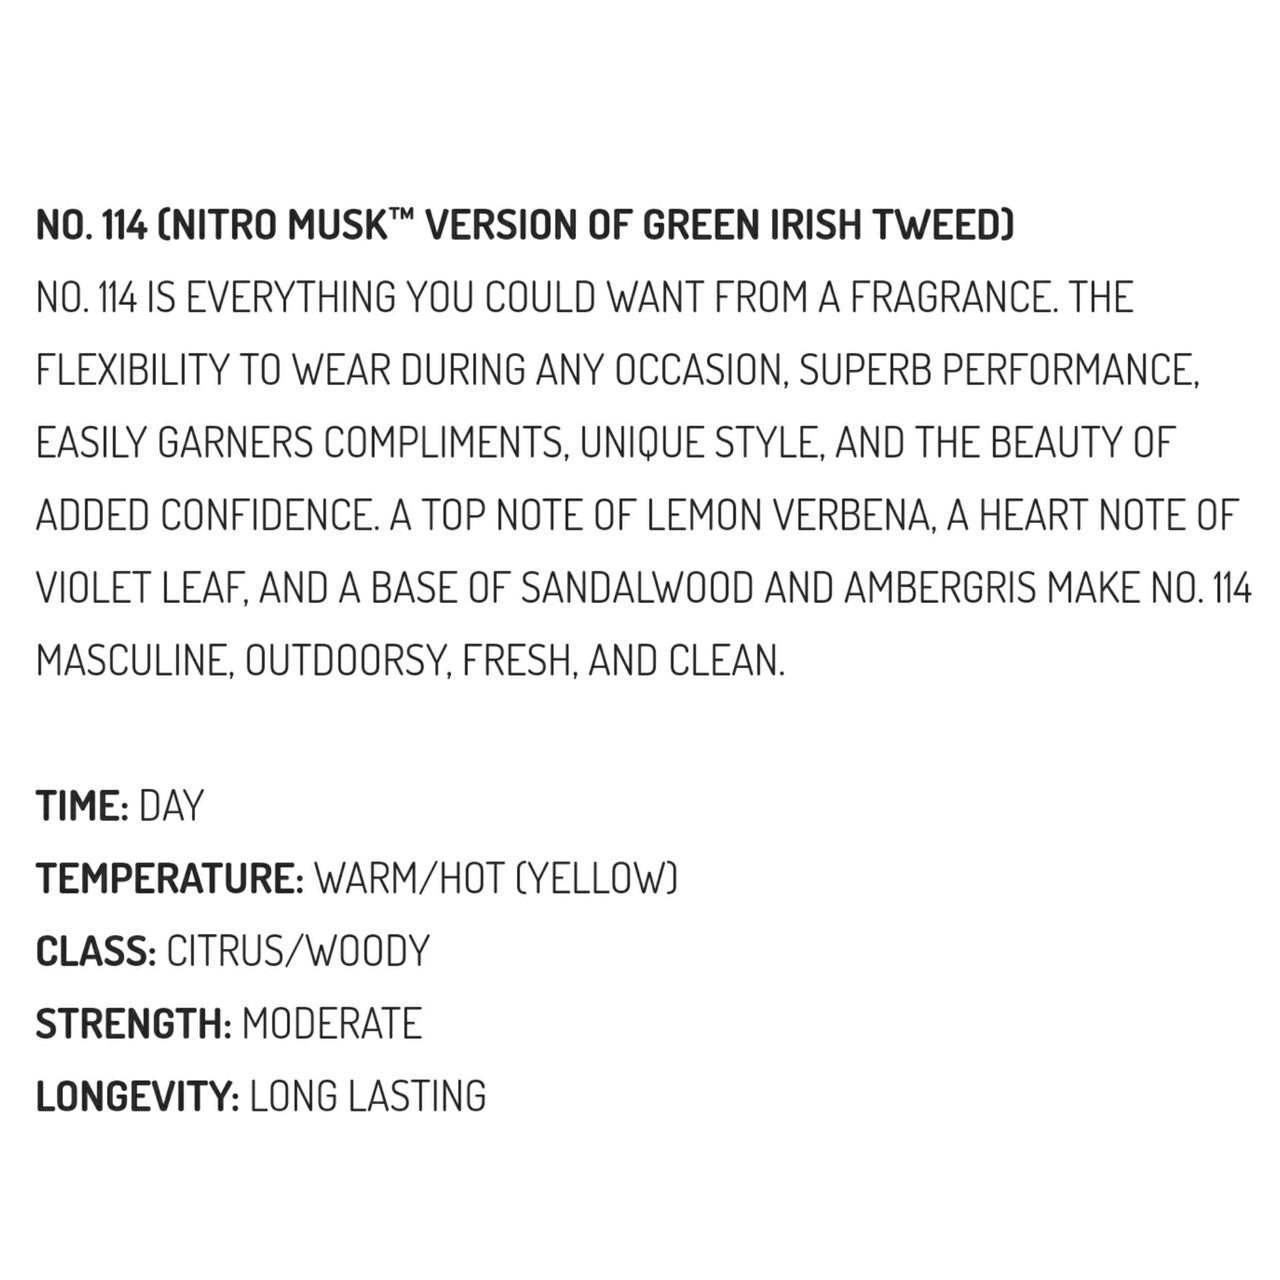 Musk & Hustle No. 114 Nitro Stubbie (Version of Green Irish Tweed)